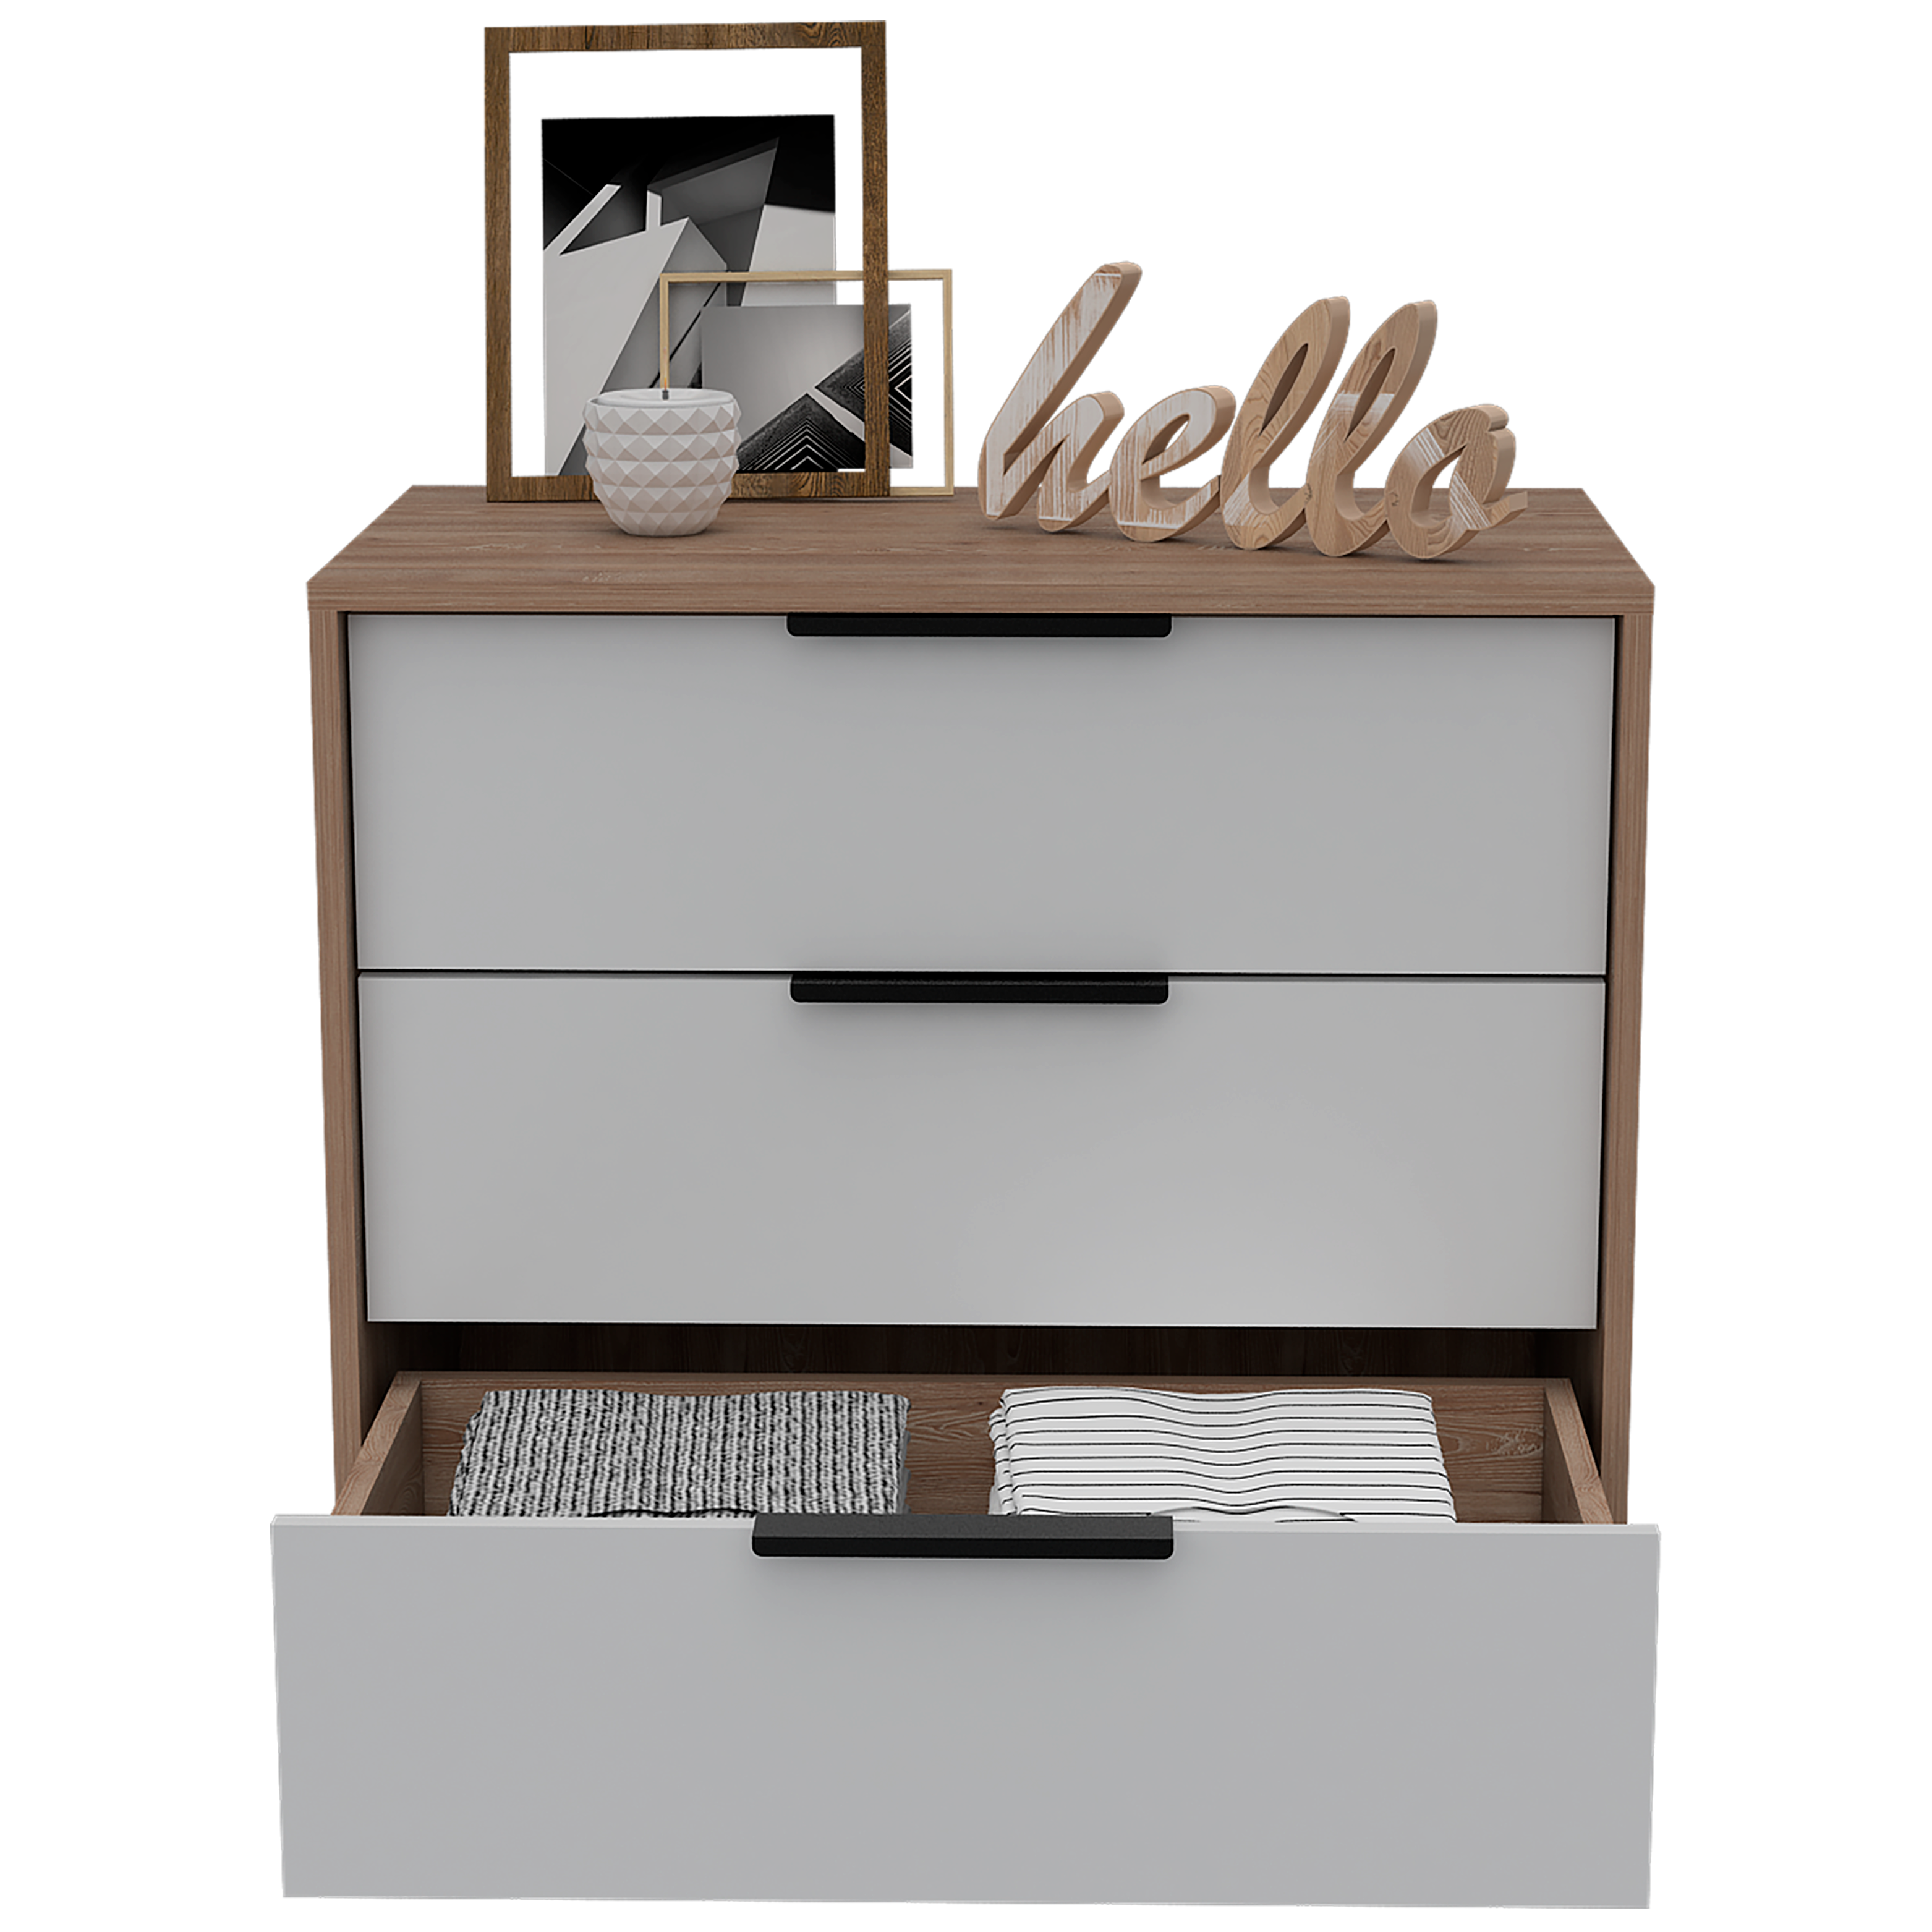 Kaia 3 Drawers Dresser Chest Drawers Rtamuebles